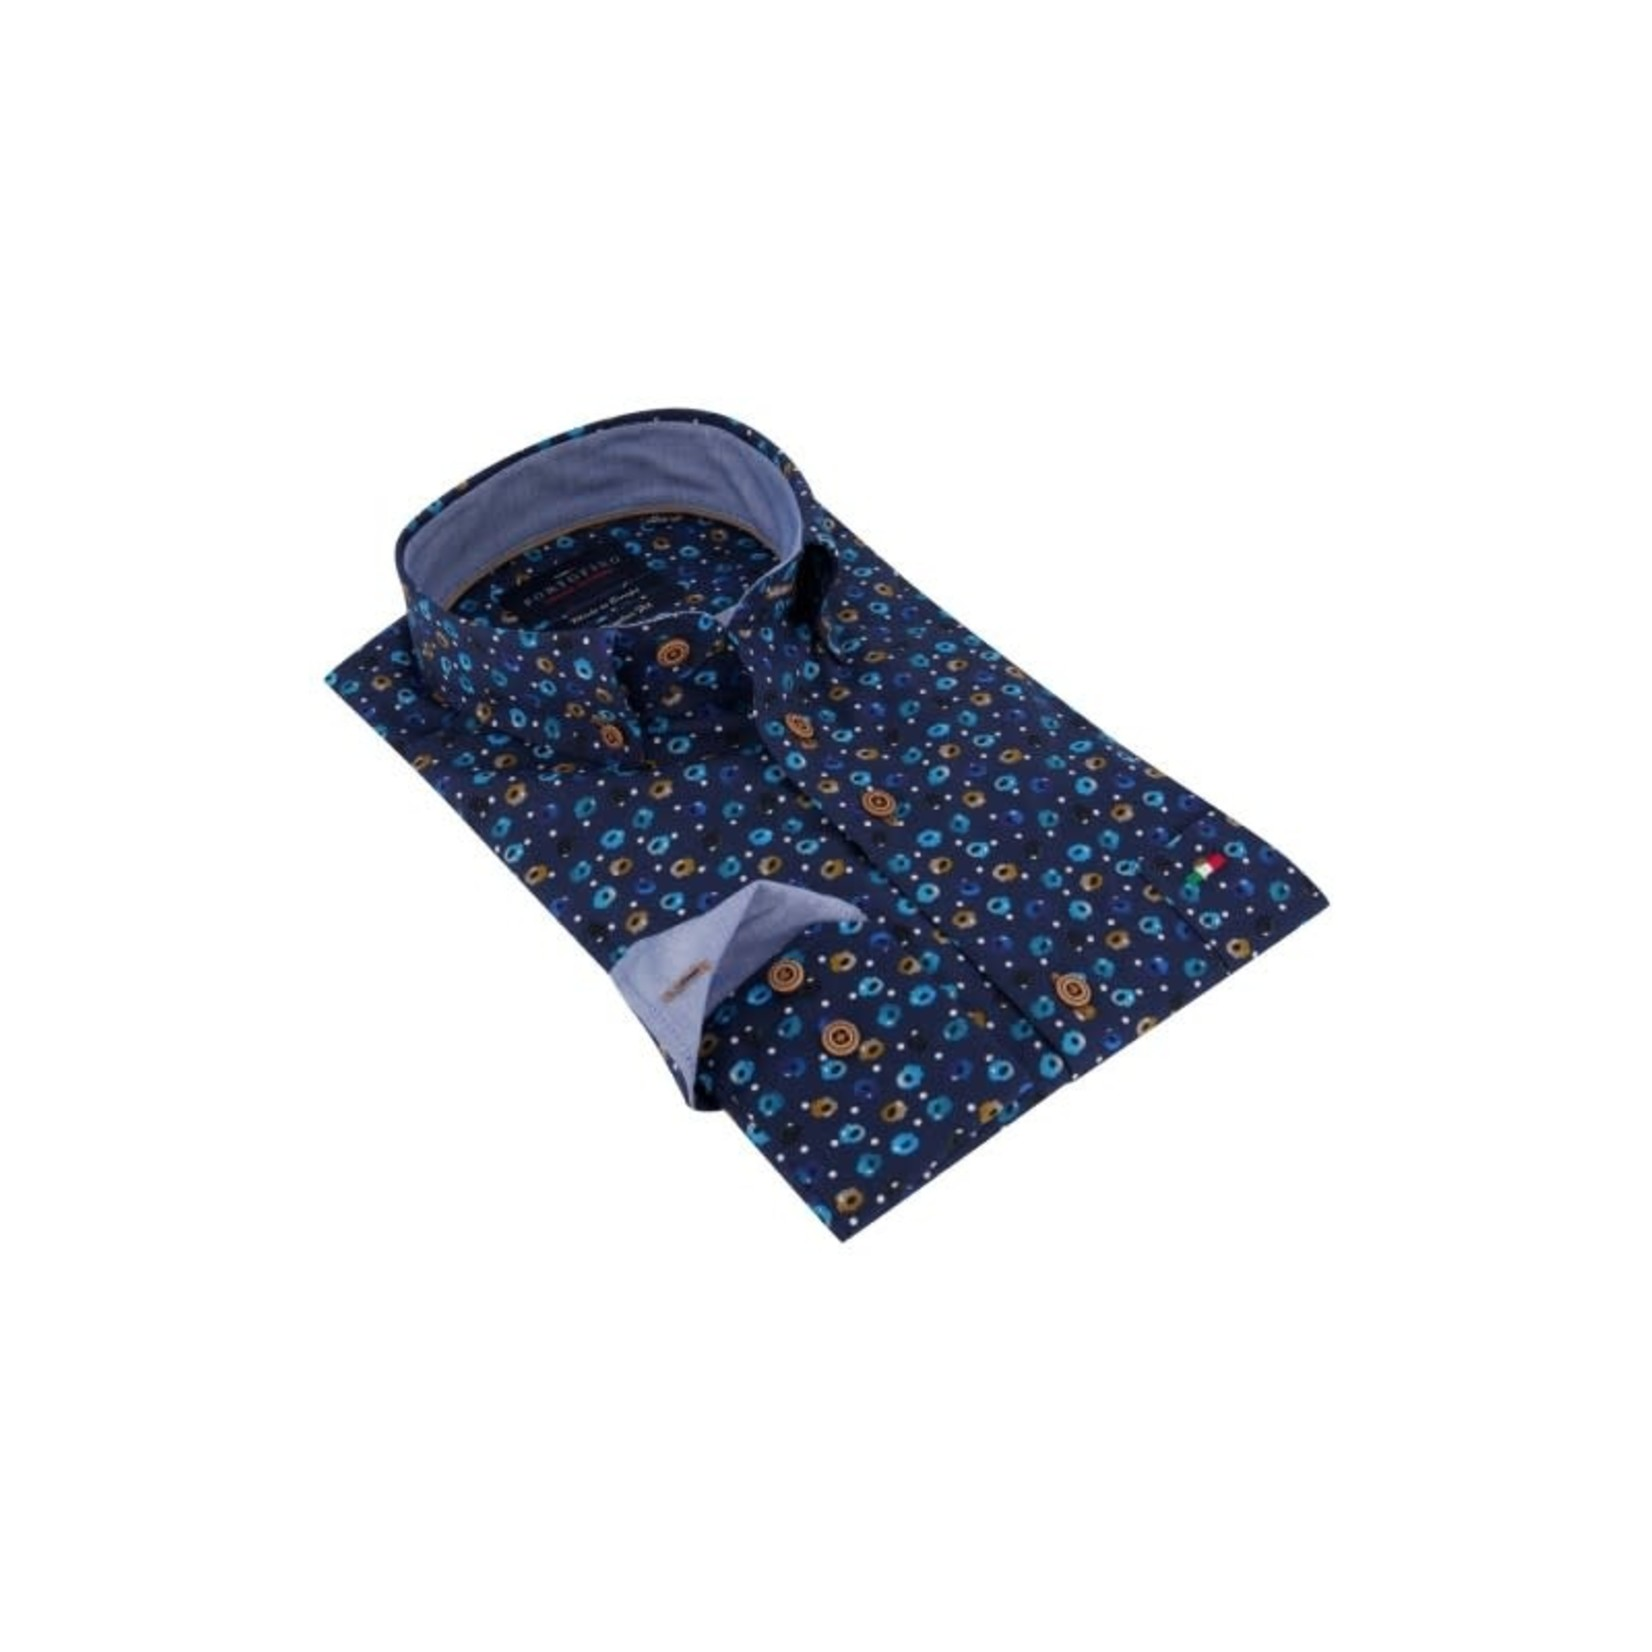 Portofino overhemd blauw print